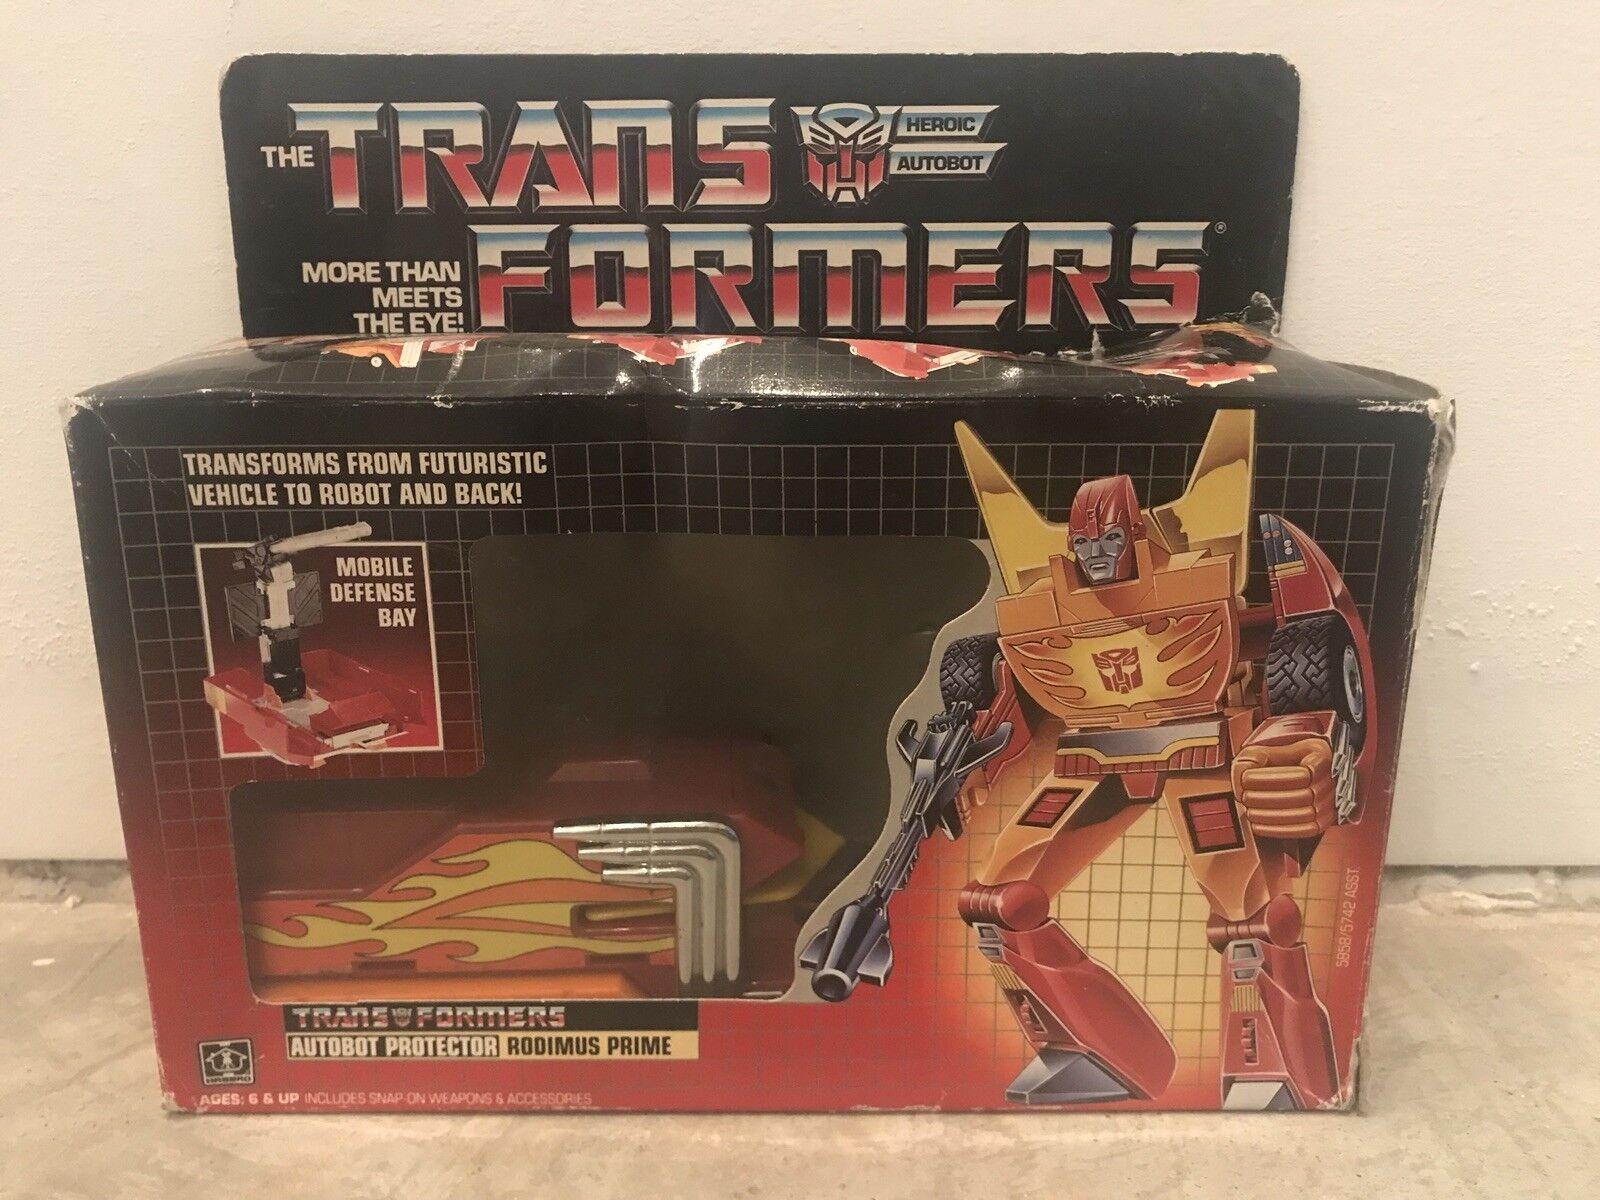 Transformers Original G1 Rodimus Prime With Box